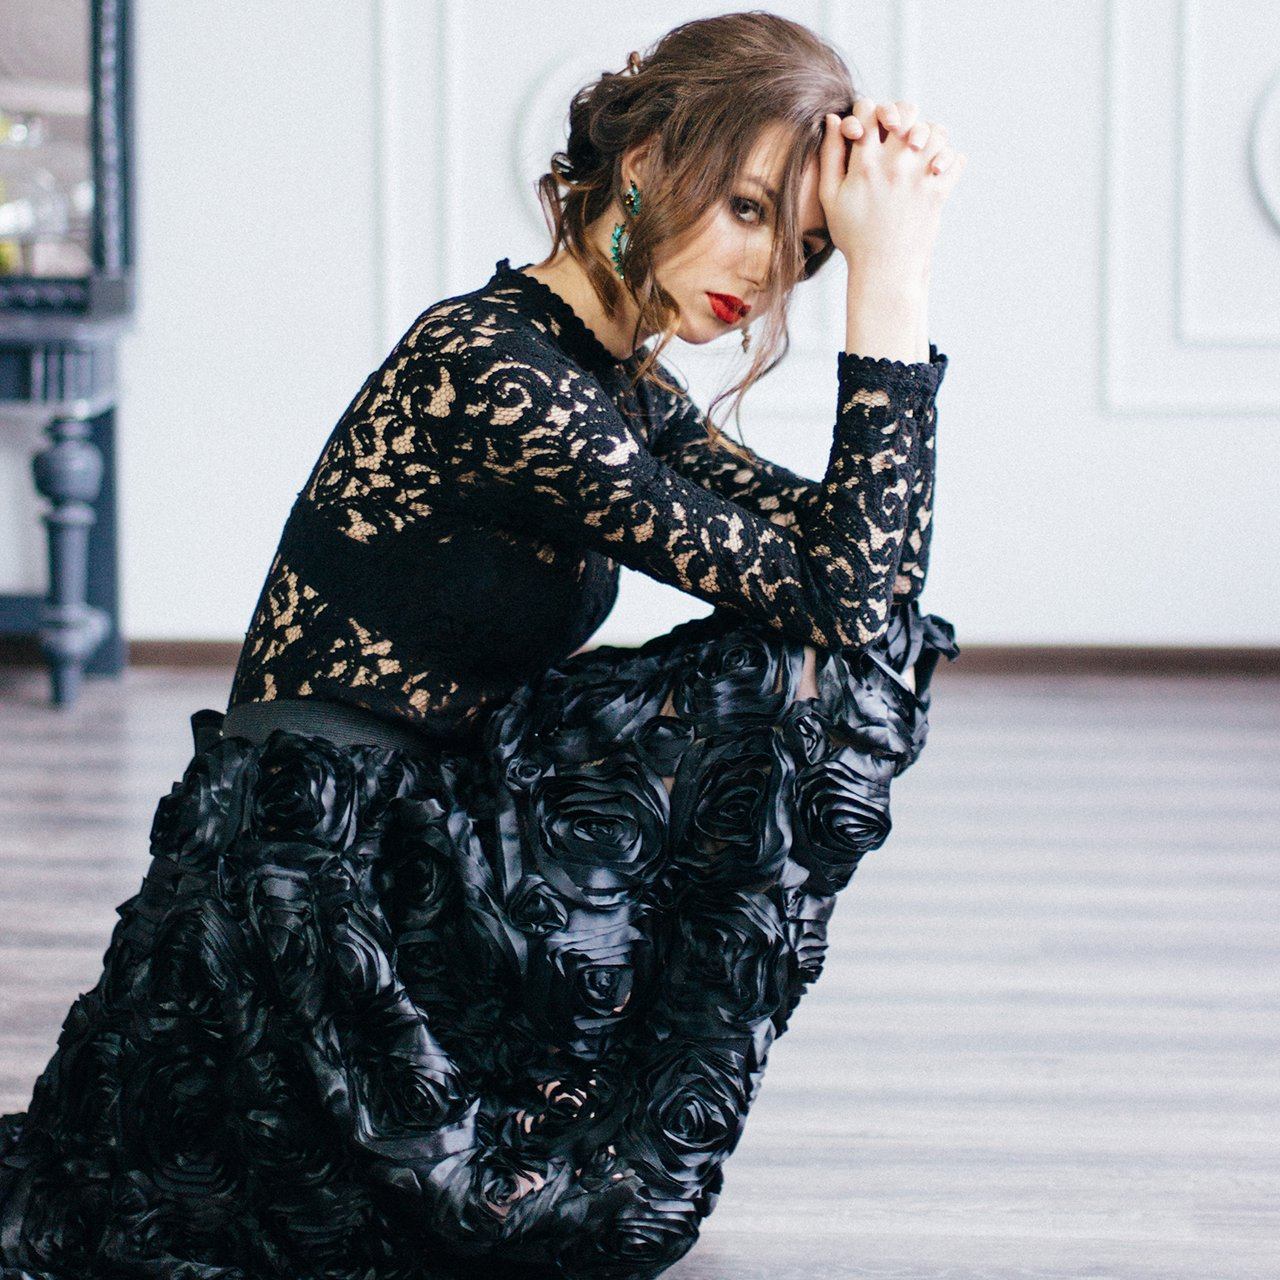 #depo13 #стилистеленаграчева #savrasov #girl #model #beautiful #fashion #style #look #penza, Саврасов Сергей